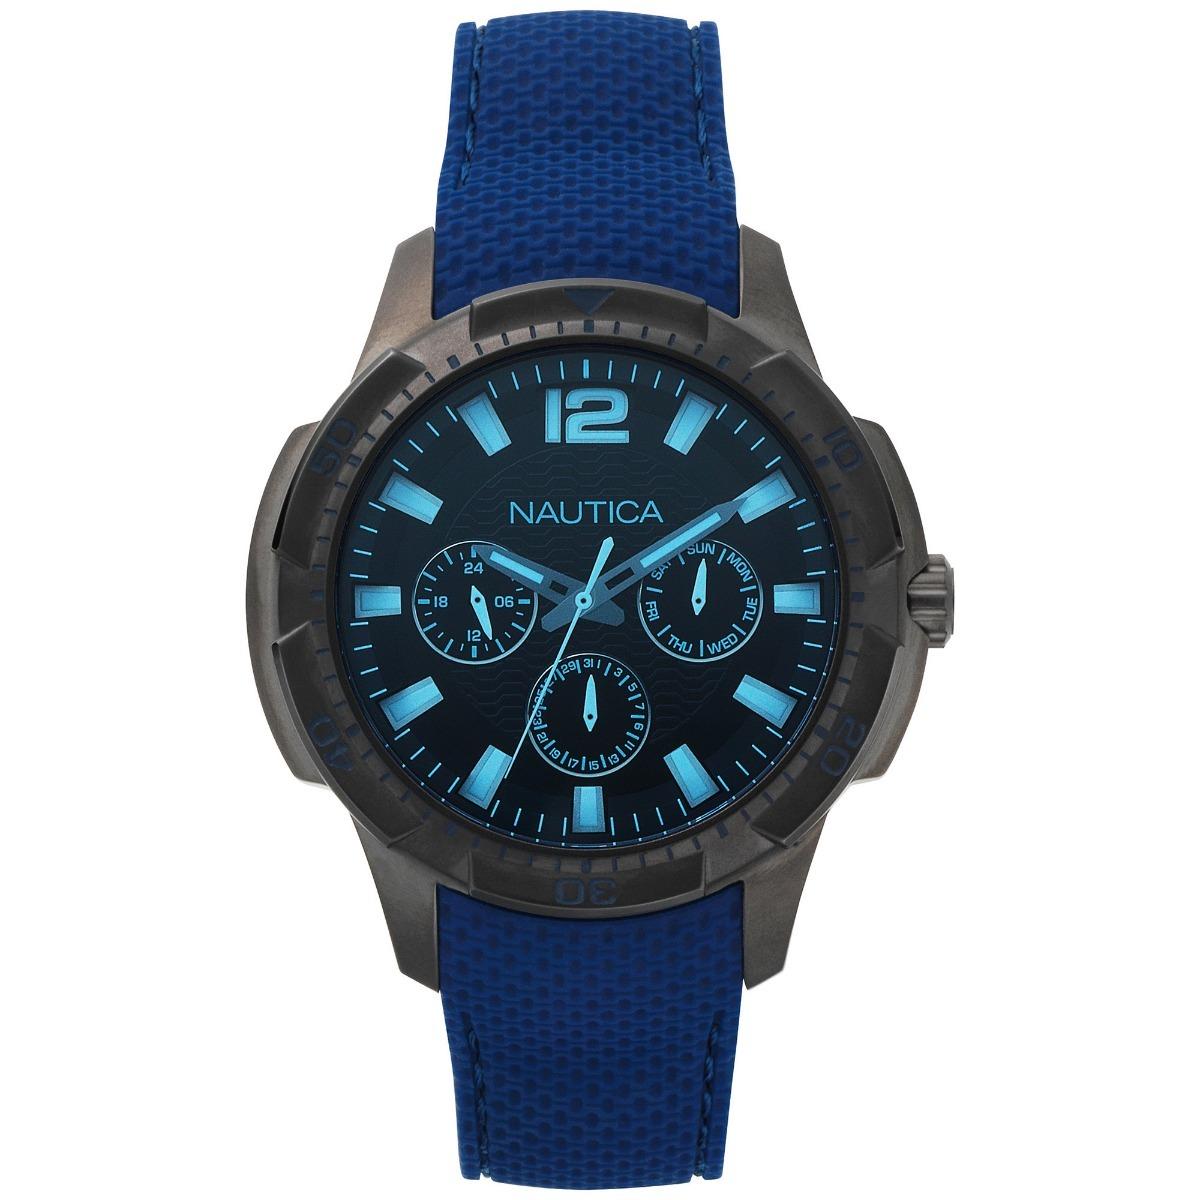 2169413cd38 Relógio Náutica Masculino Multifunções San Diego Napsdg004 - R  749 ...